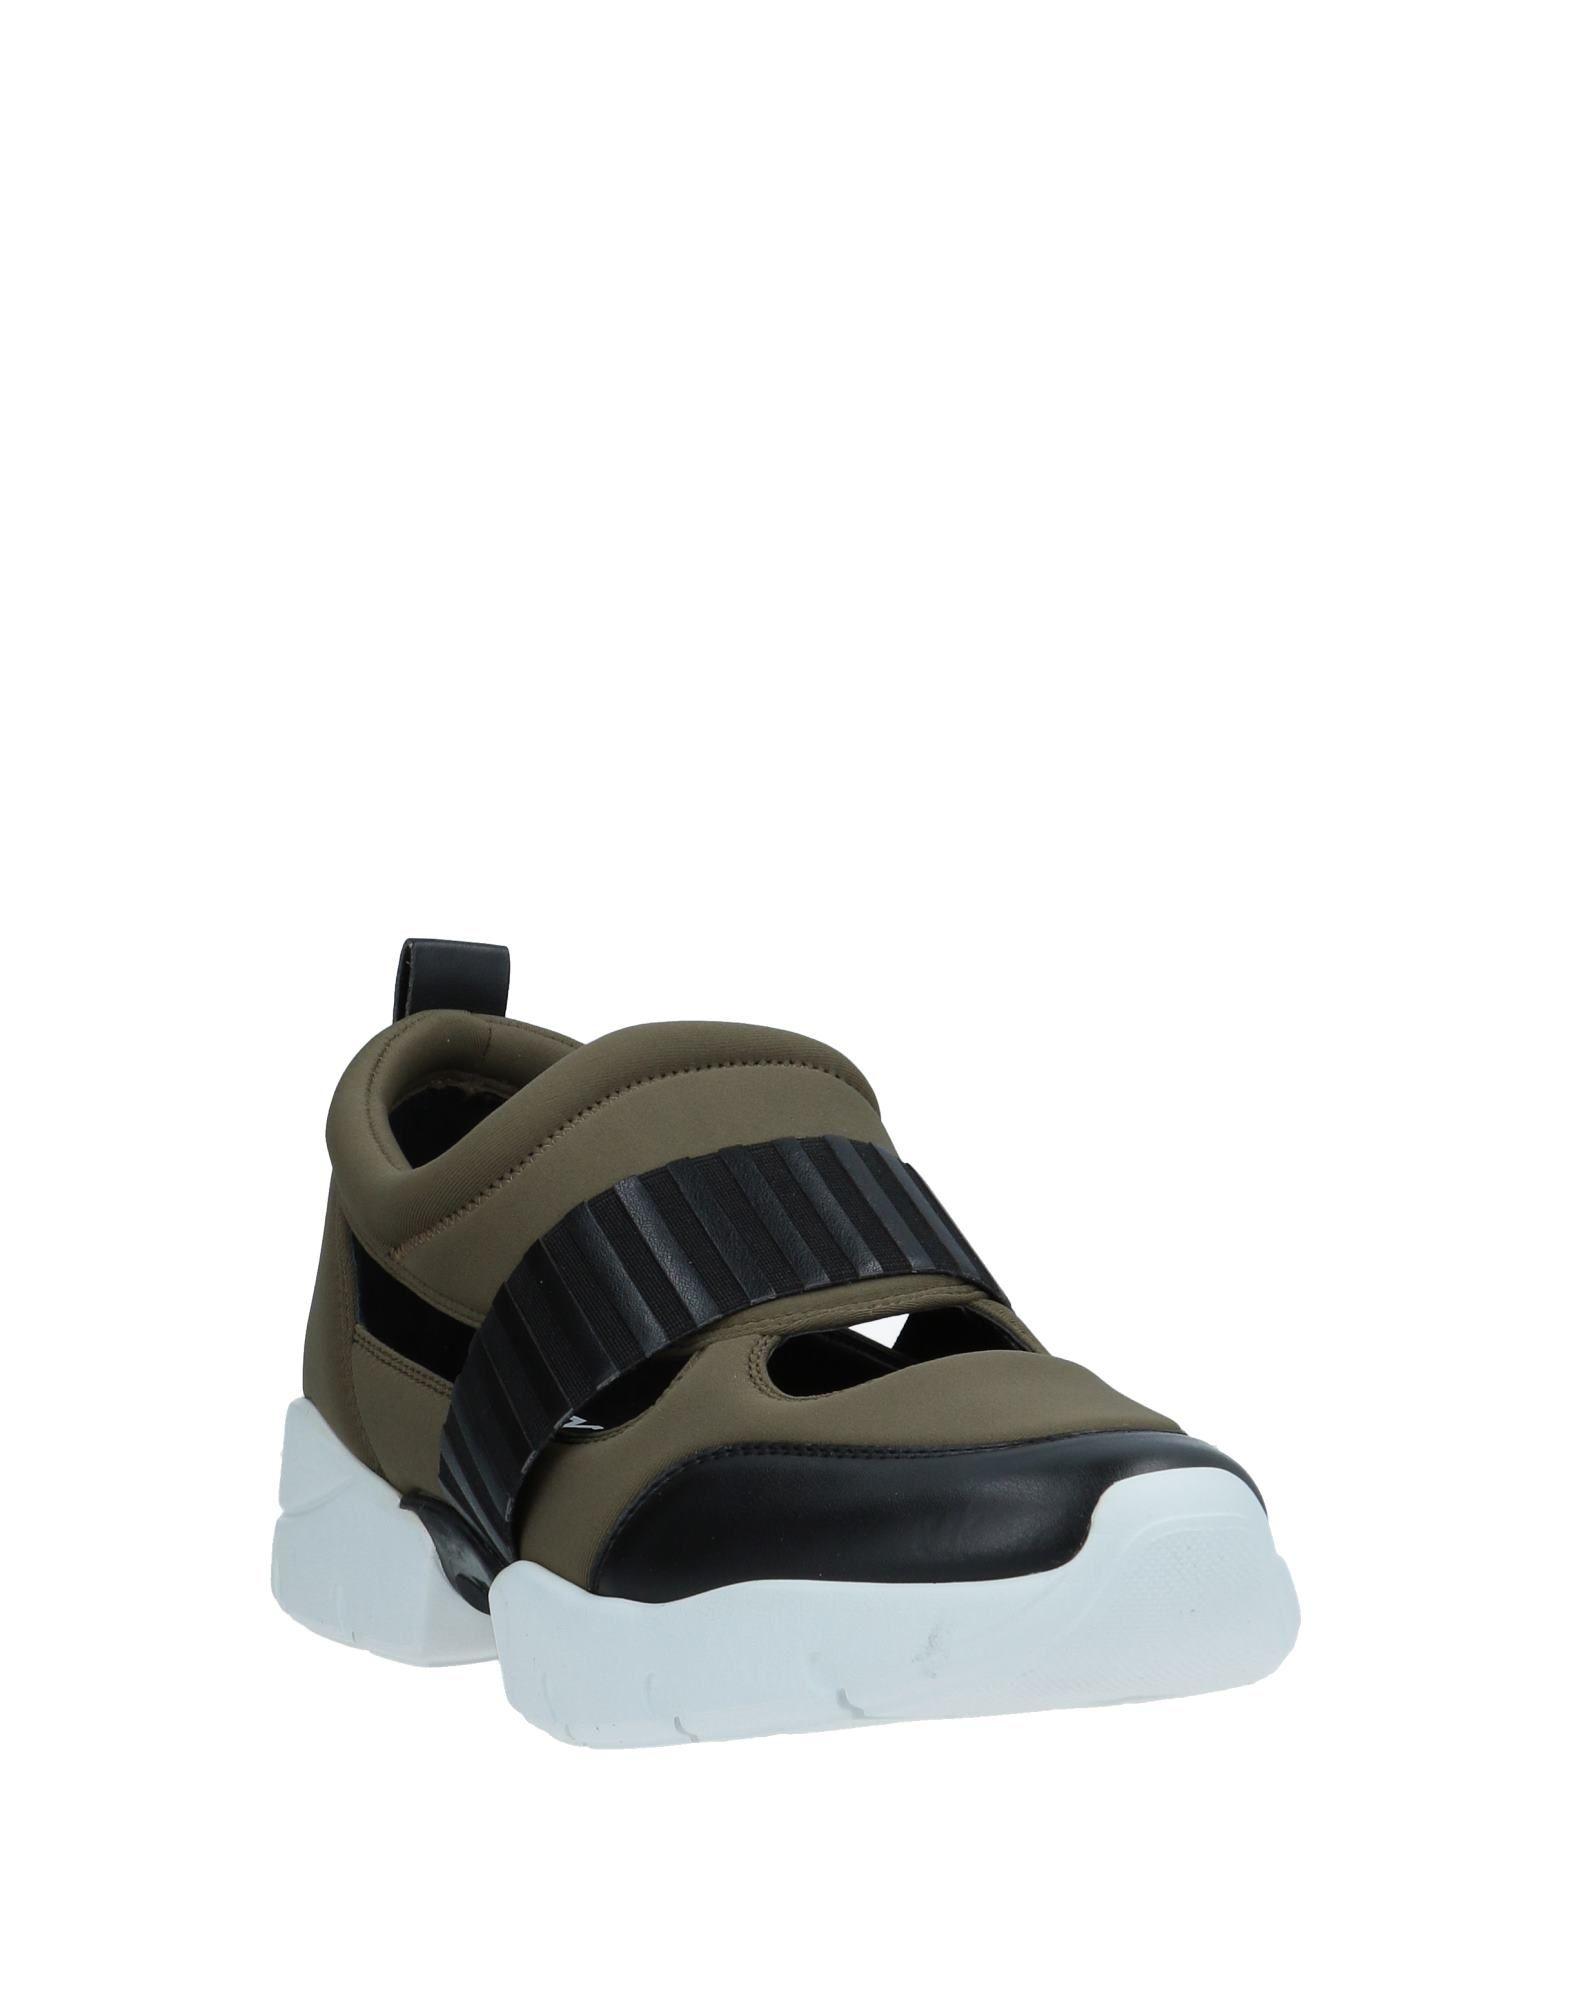 Stilvolle Sneakers billige Schuhe Grau Mer Sneakers Stilvolle Damen  11560297NV d15084